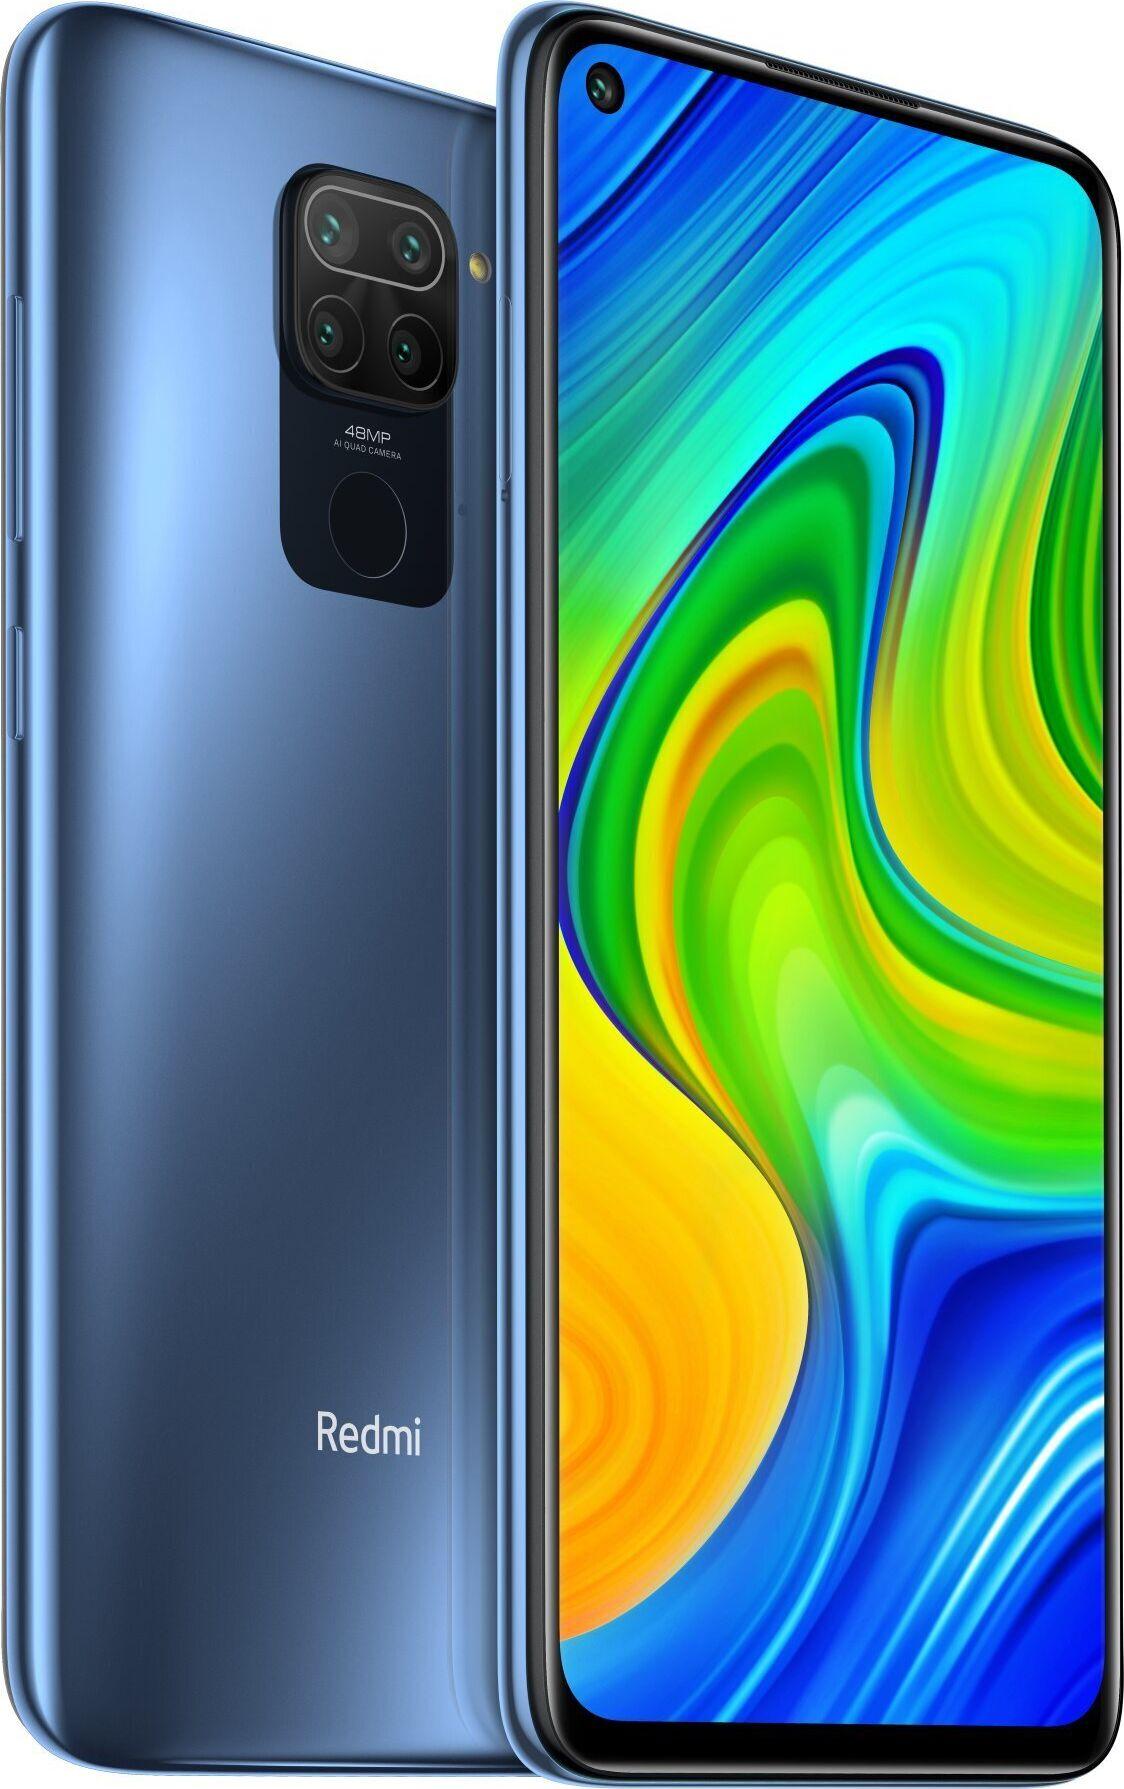 Smartfon Xiaomi Redmi Note 9 64 GB Dual SIM Szary (27990) xiaomi_20200603114732 Mobilais Telefons